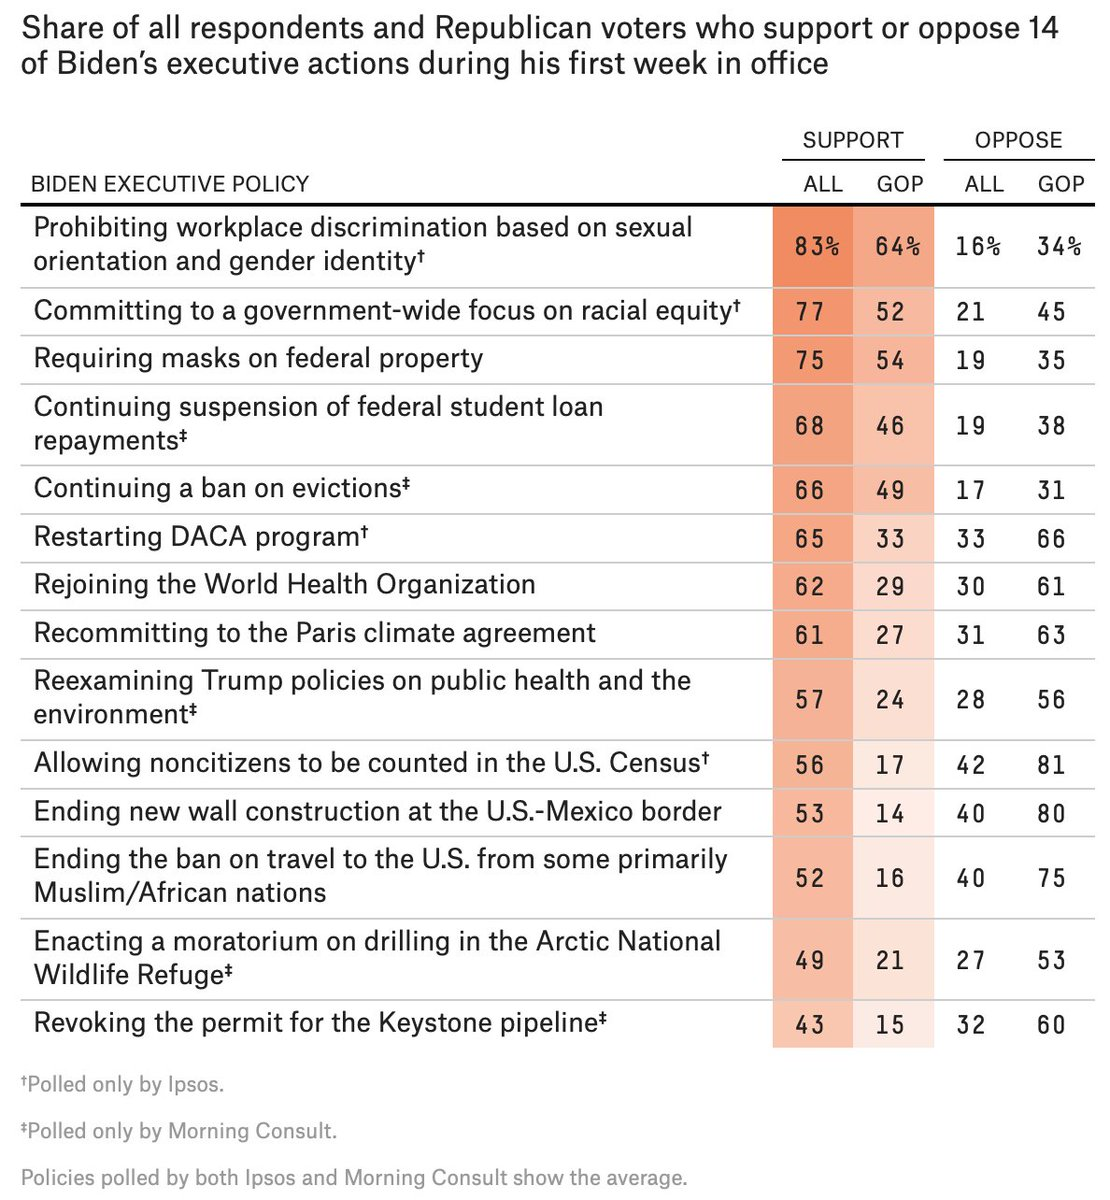 Most of Biden's executive actions so far are popular.